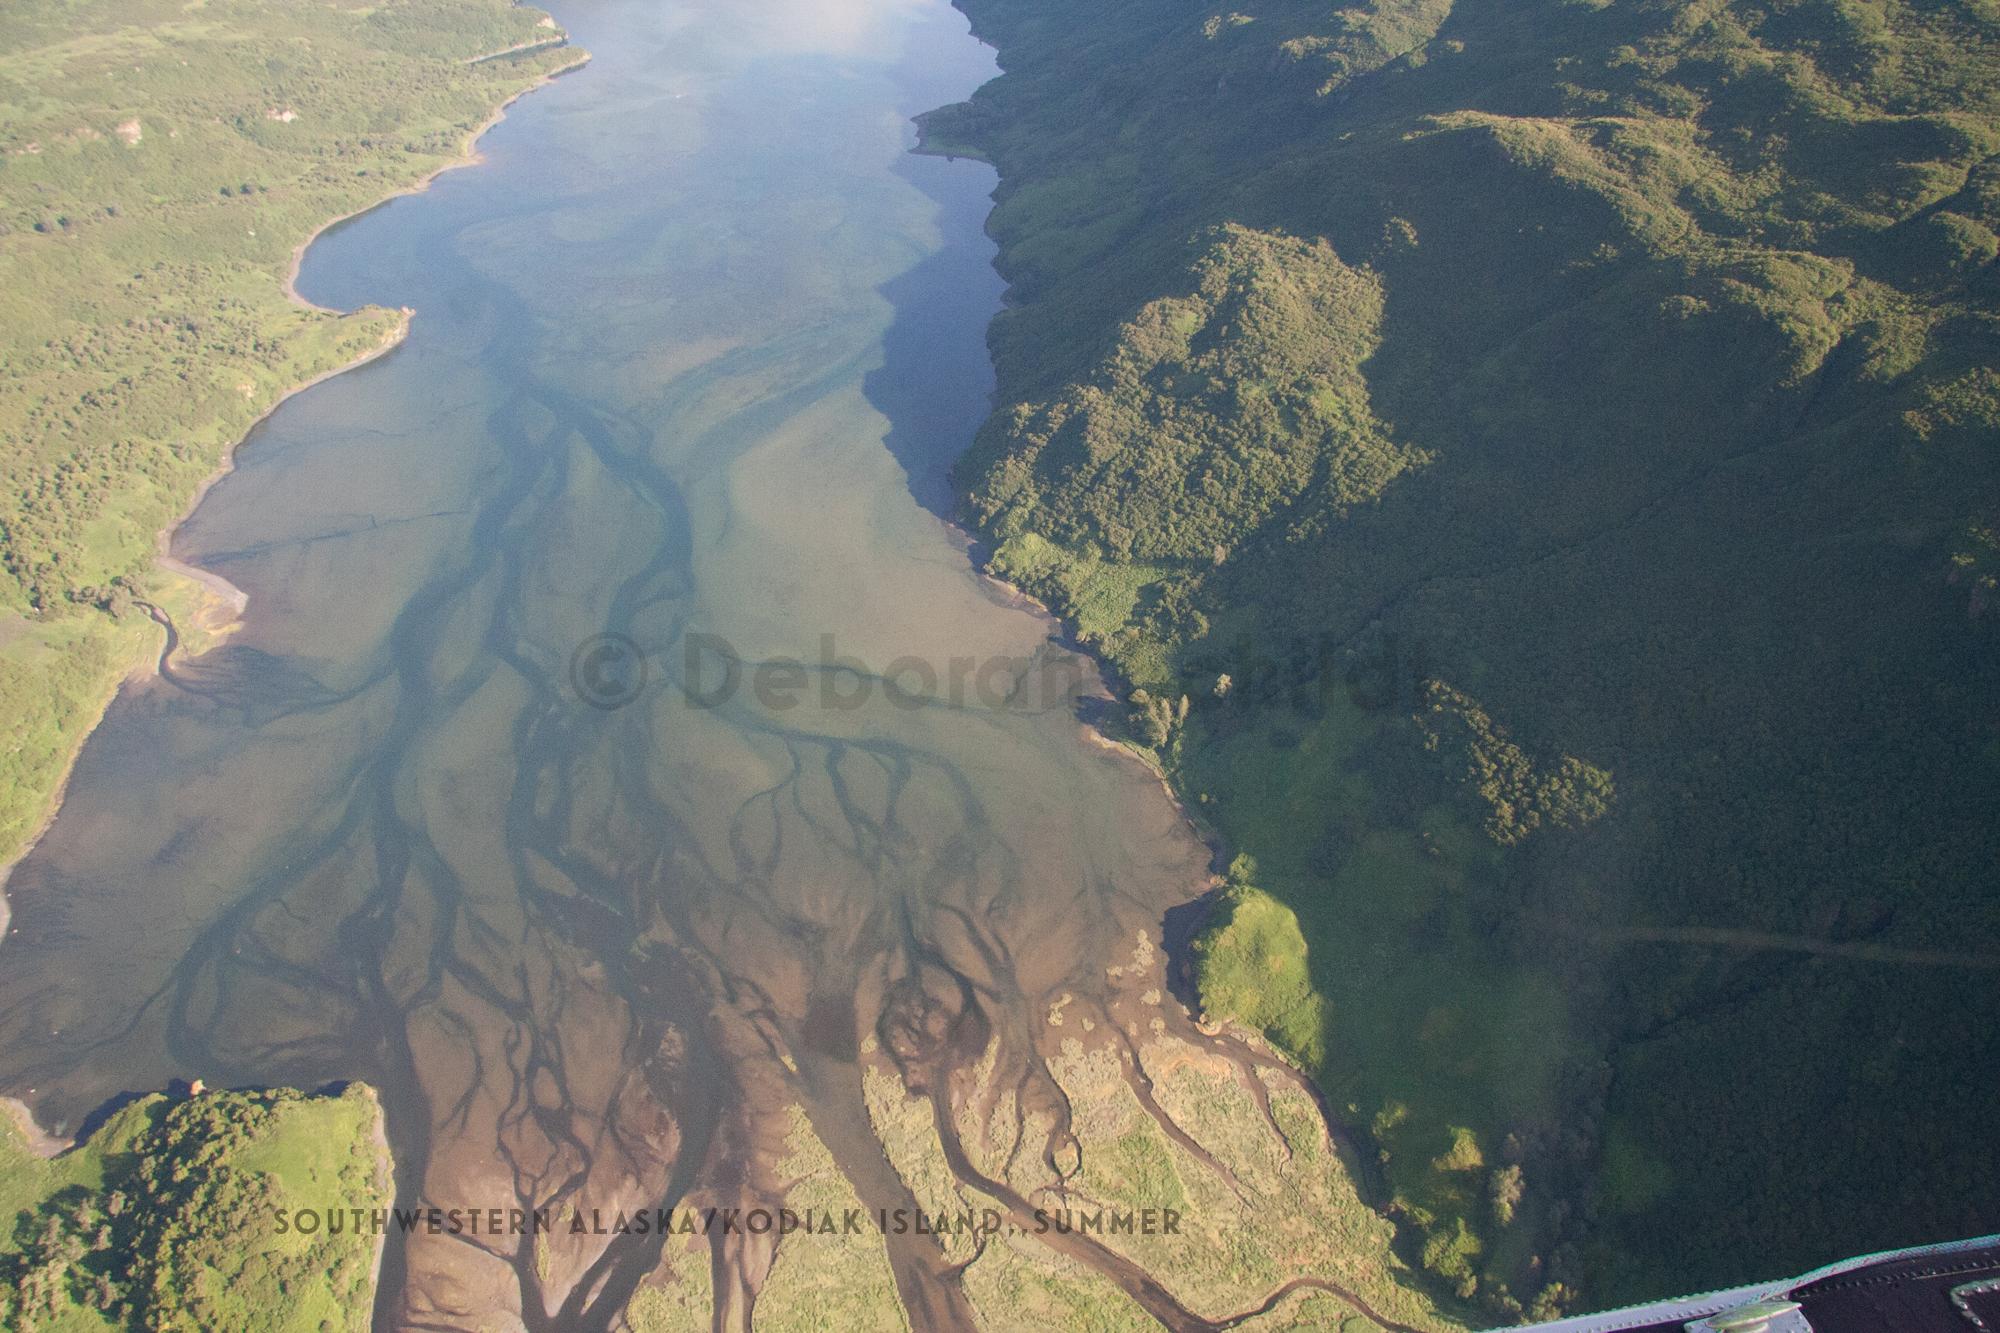 CT6 Southwestern Alaska:Kodiak_ summer copy.jpg